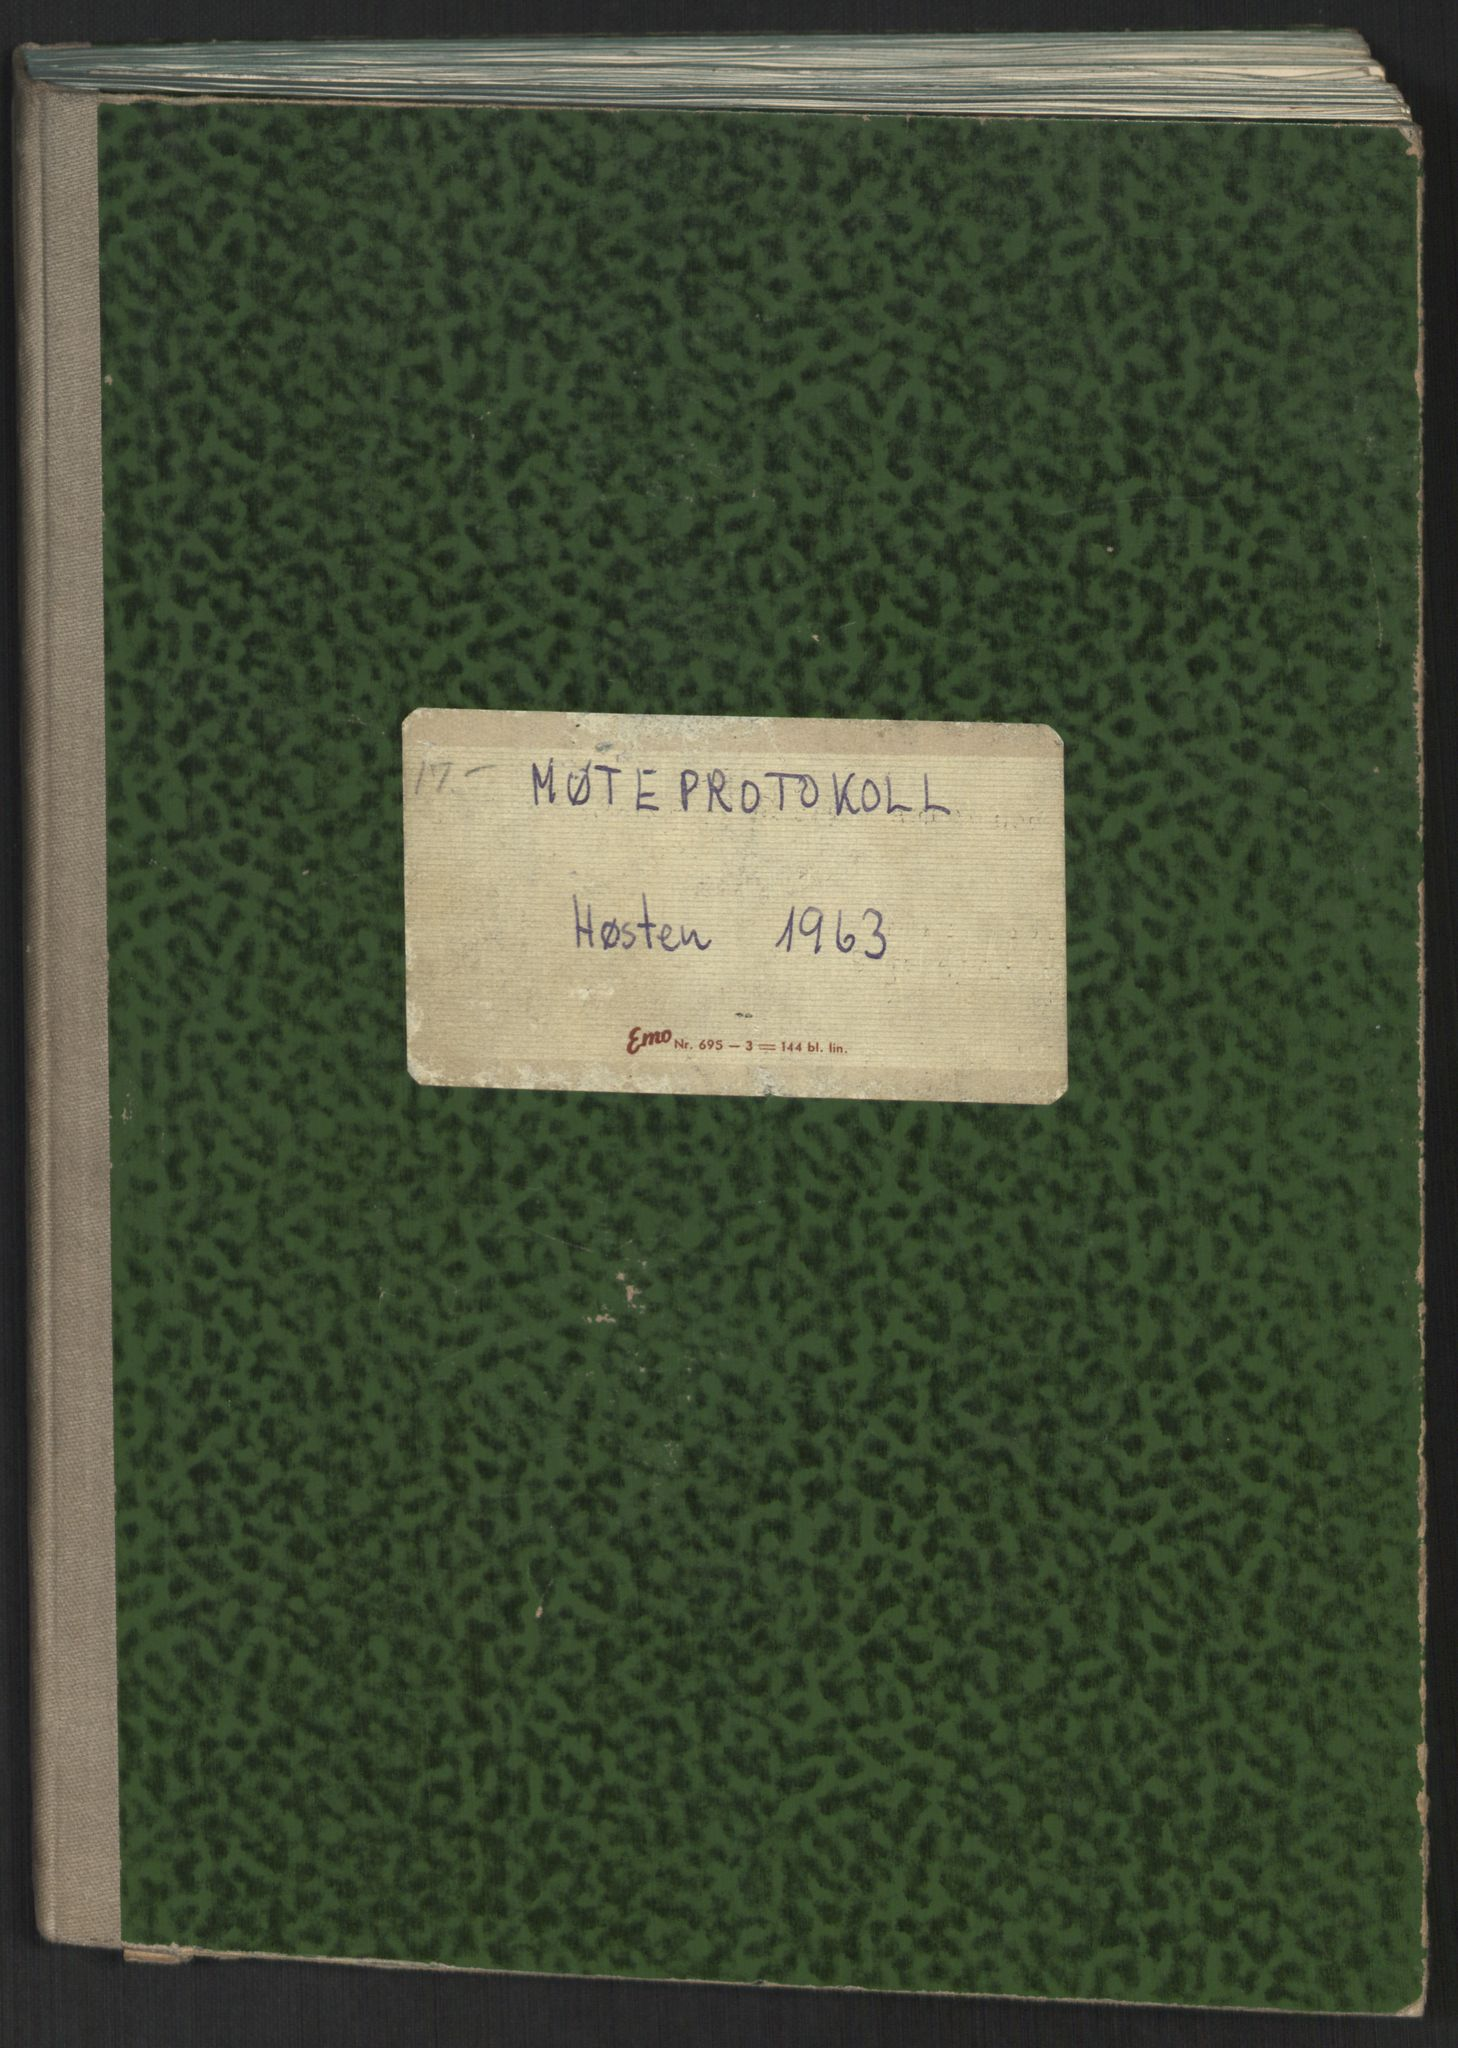 RA, Det Norske Studentersamfund, A/Ac/L0021: Møteprotokoller, 1963